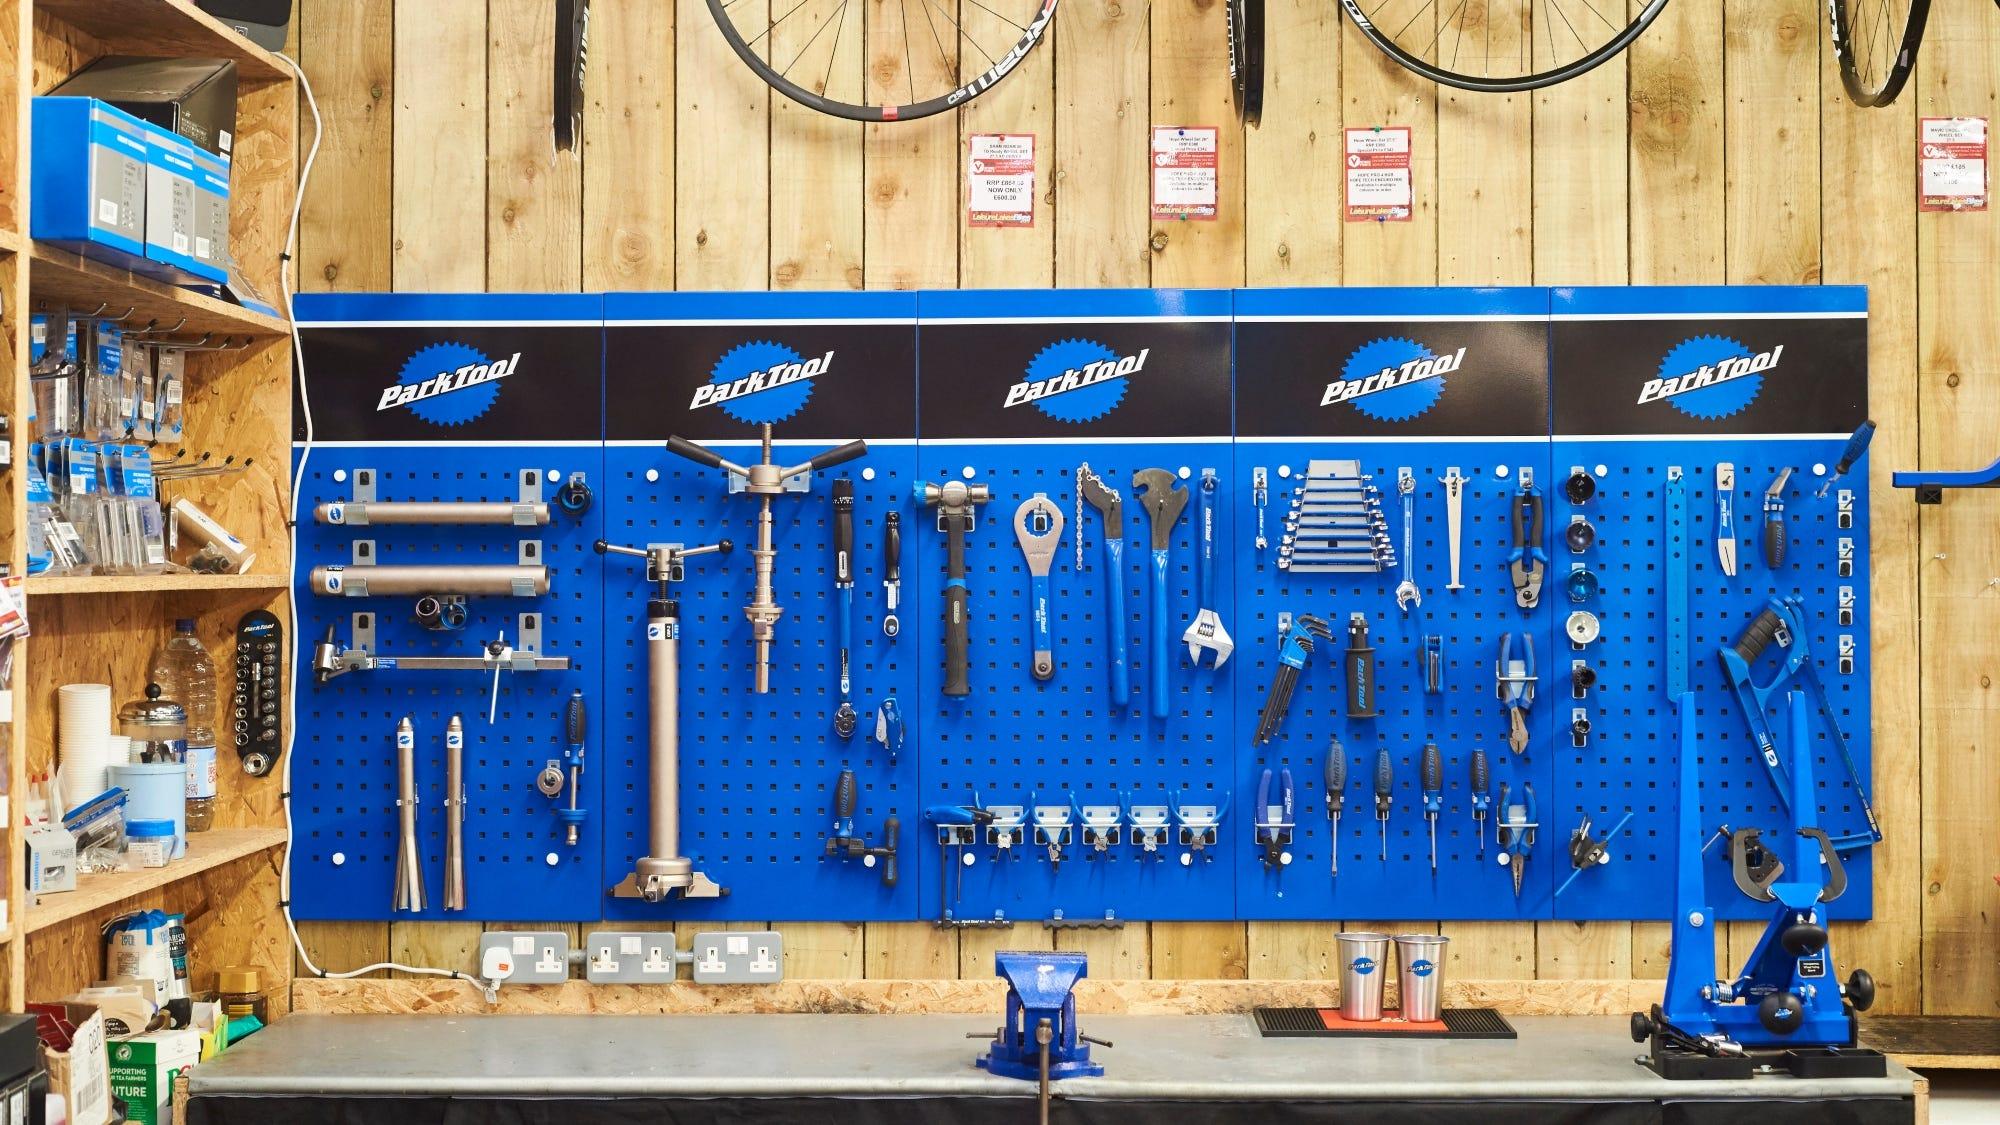 Home bike checks with Park Tool